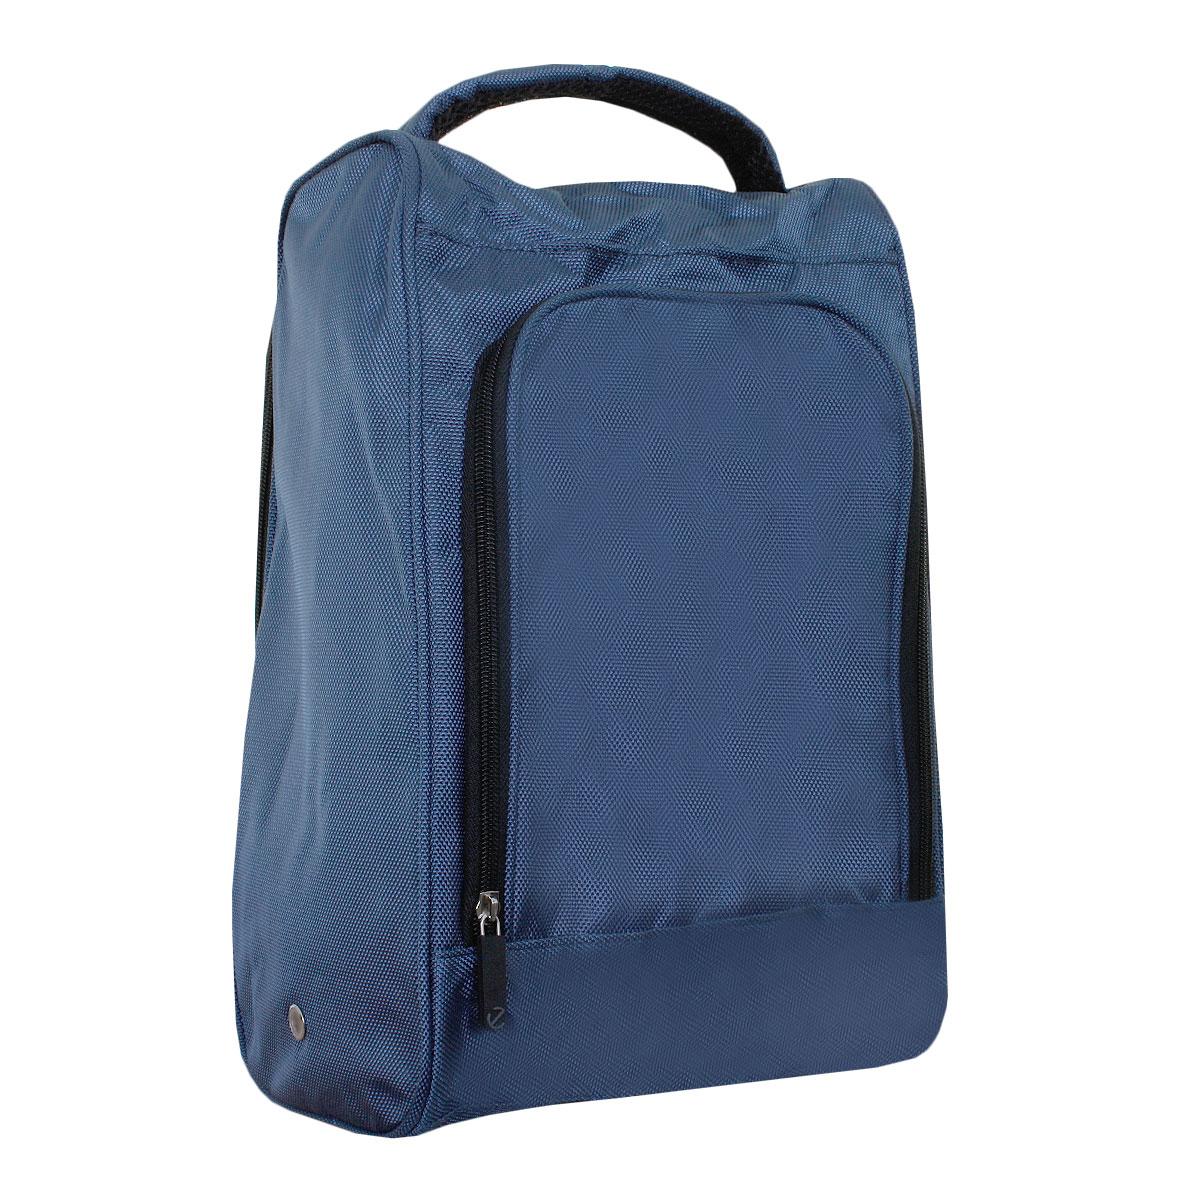 7d087c52680f Ecco Unisex 2019 Shoe Golf Travel Zipped Tote Storage Pouch Bag